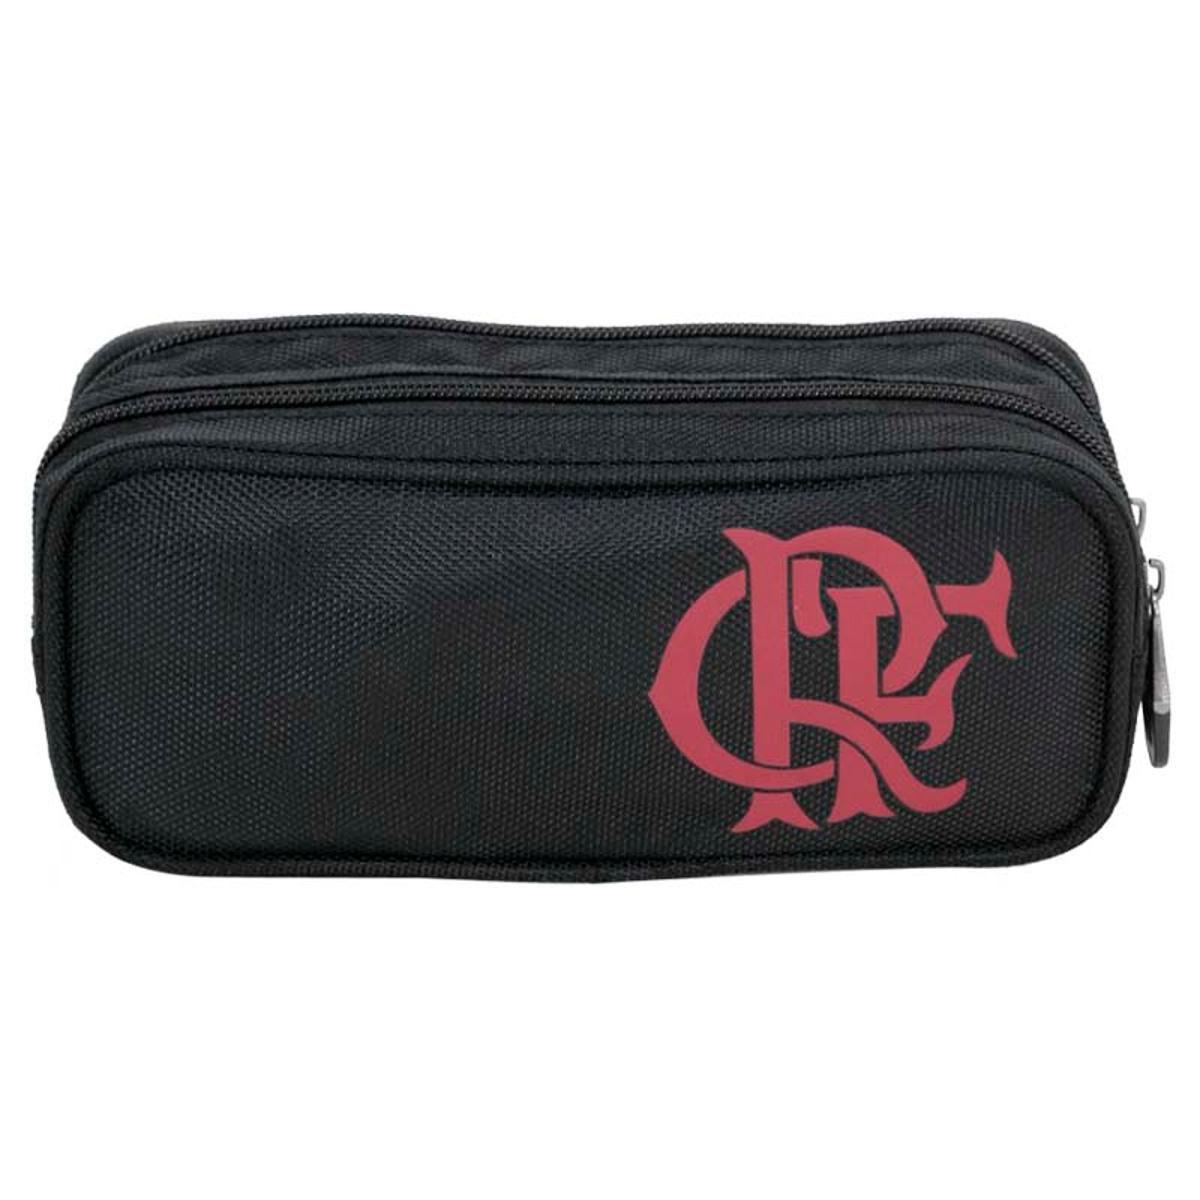 Estojo Flamengo Duplo Xeryus - Preto e Vermelho ref 8291